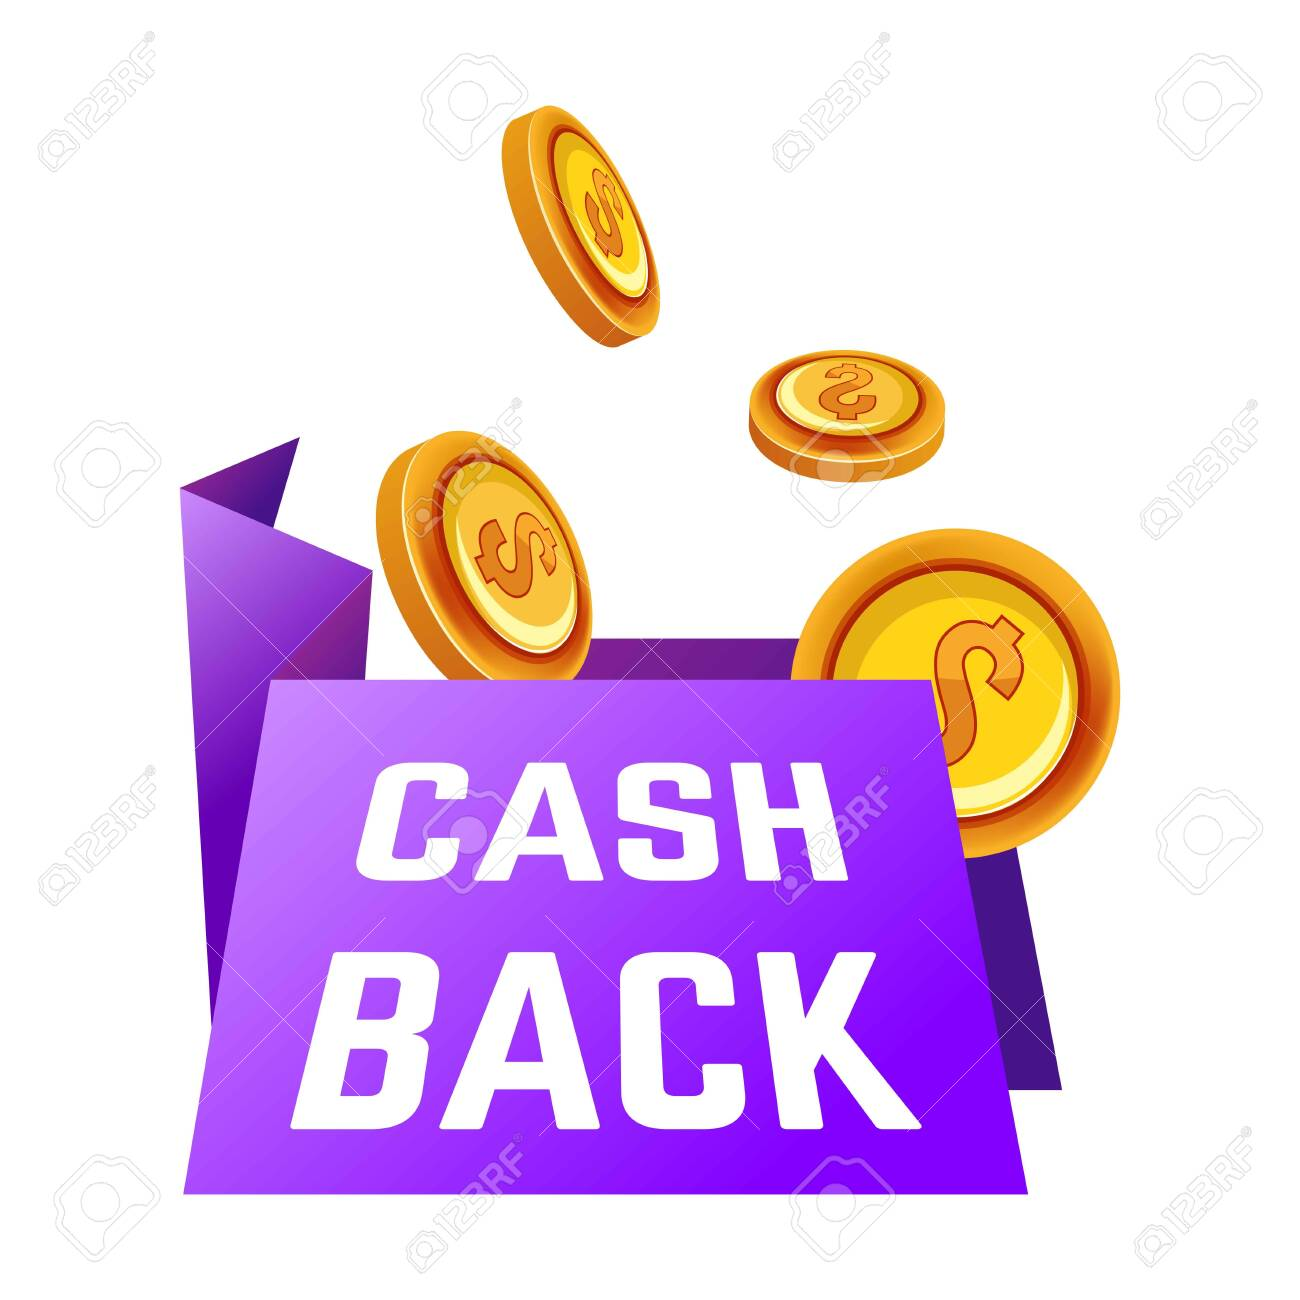 Cash back goods cosmo pu 100 130